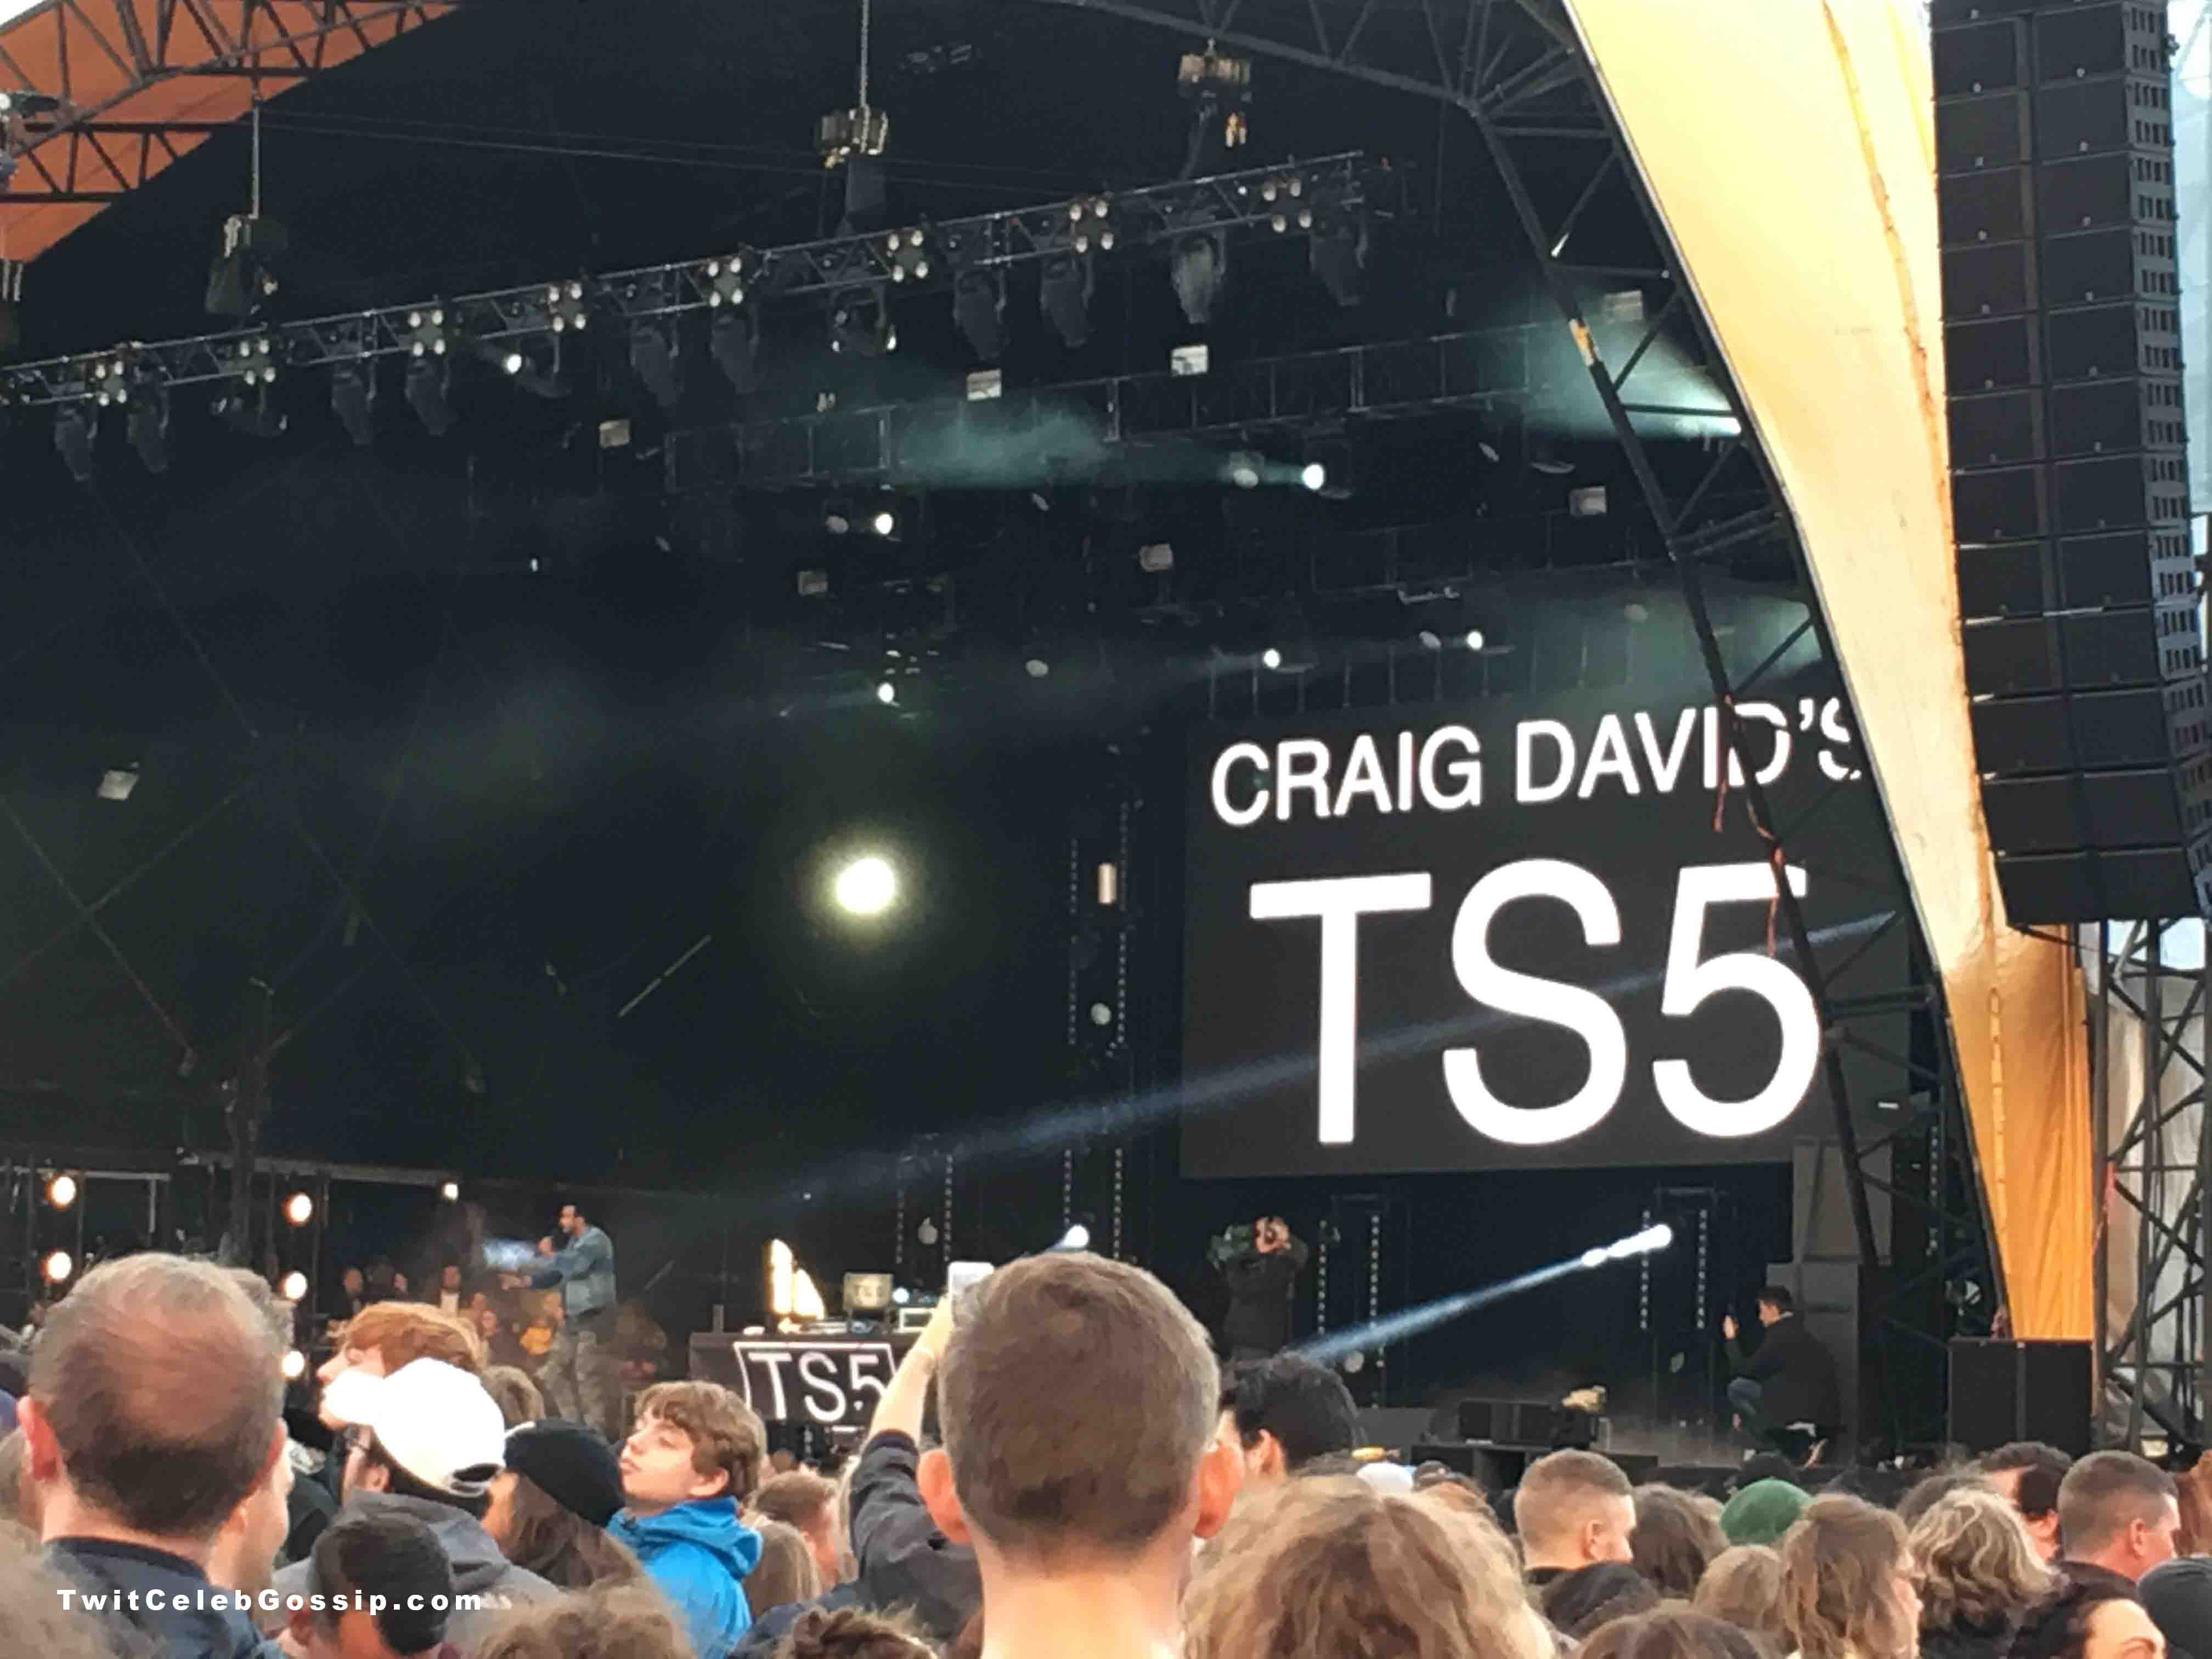 Craig-David-Fusion-Festival-2016-Stage